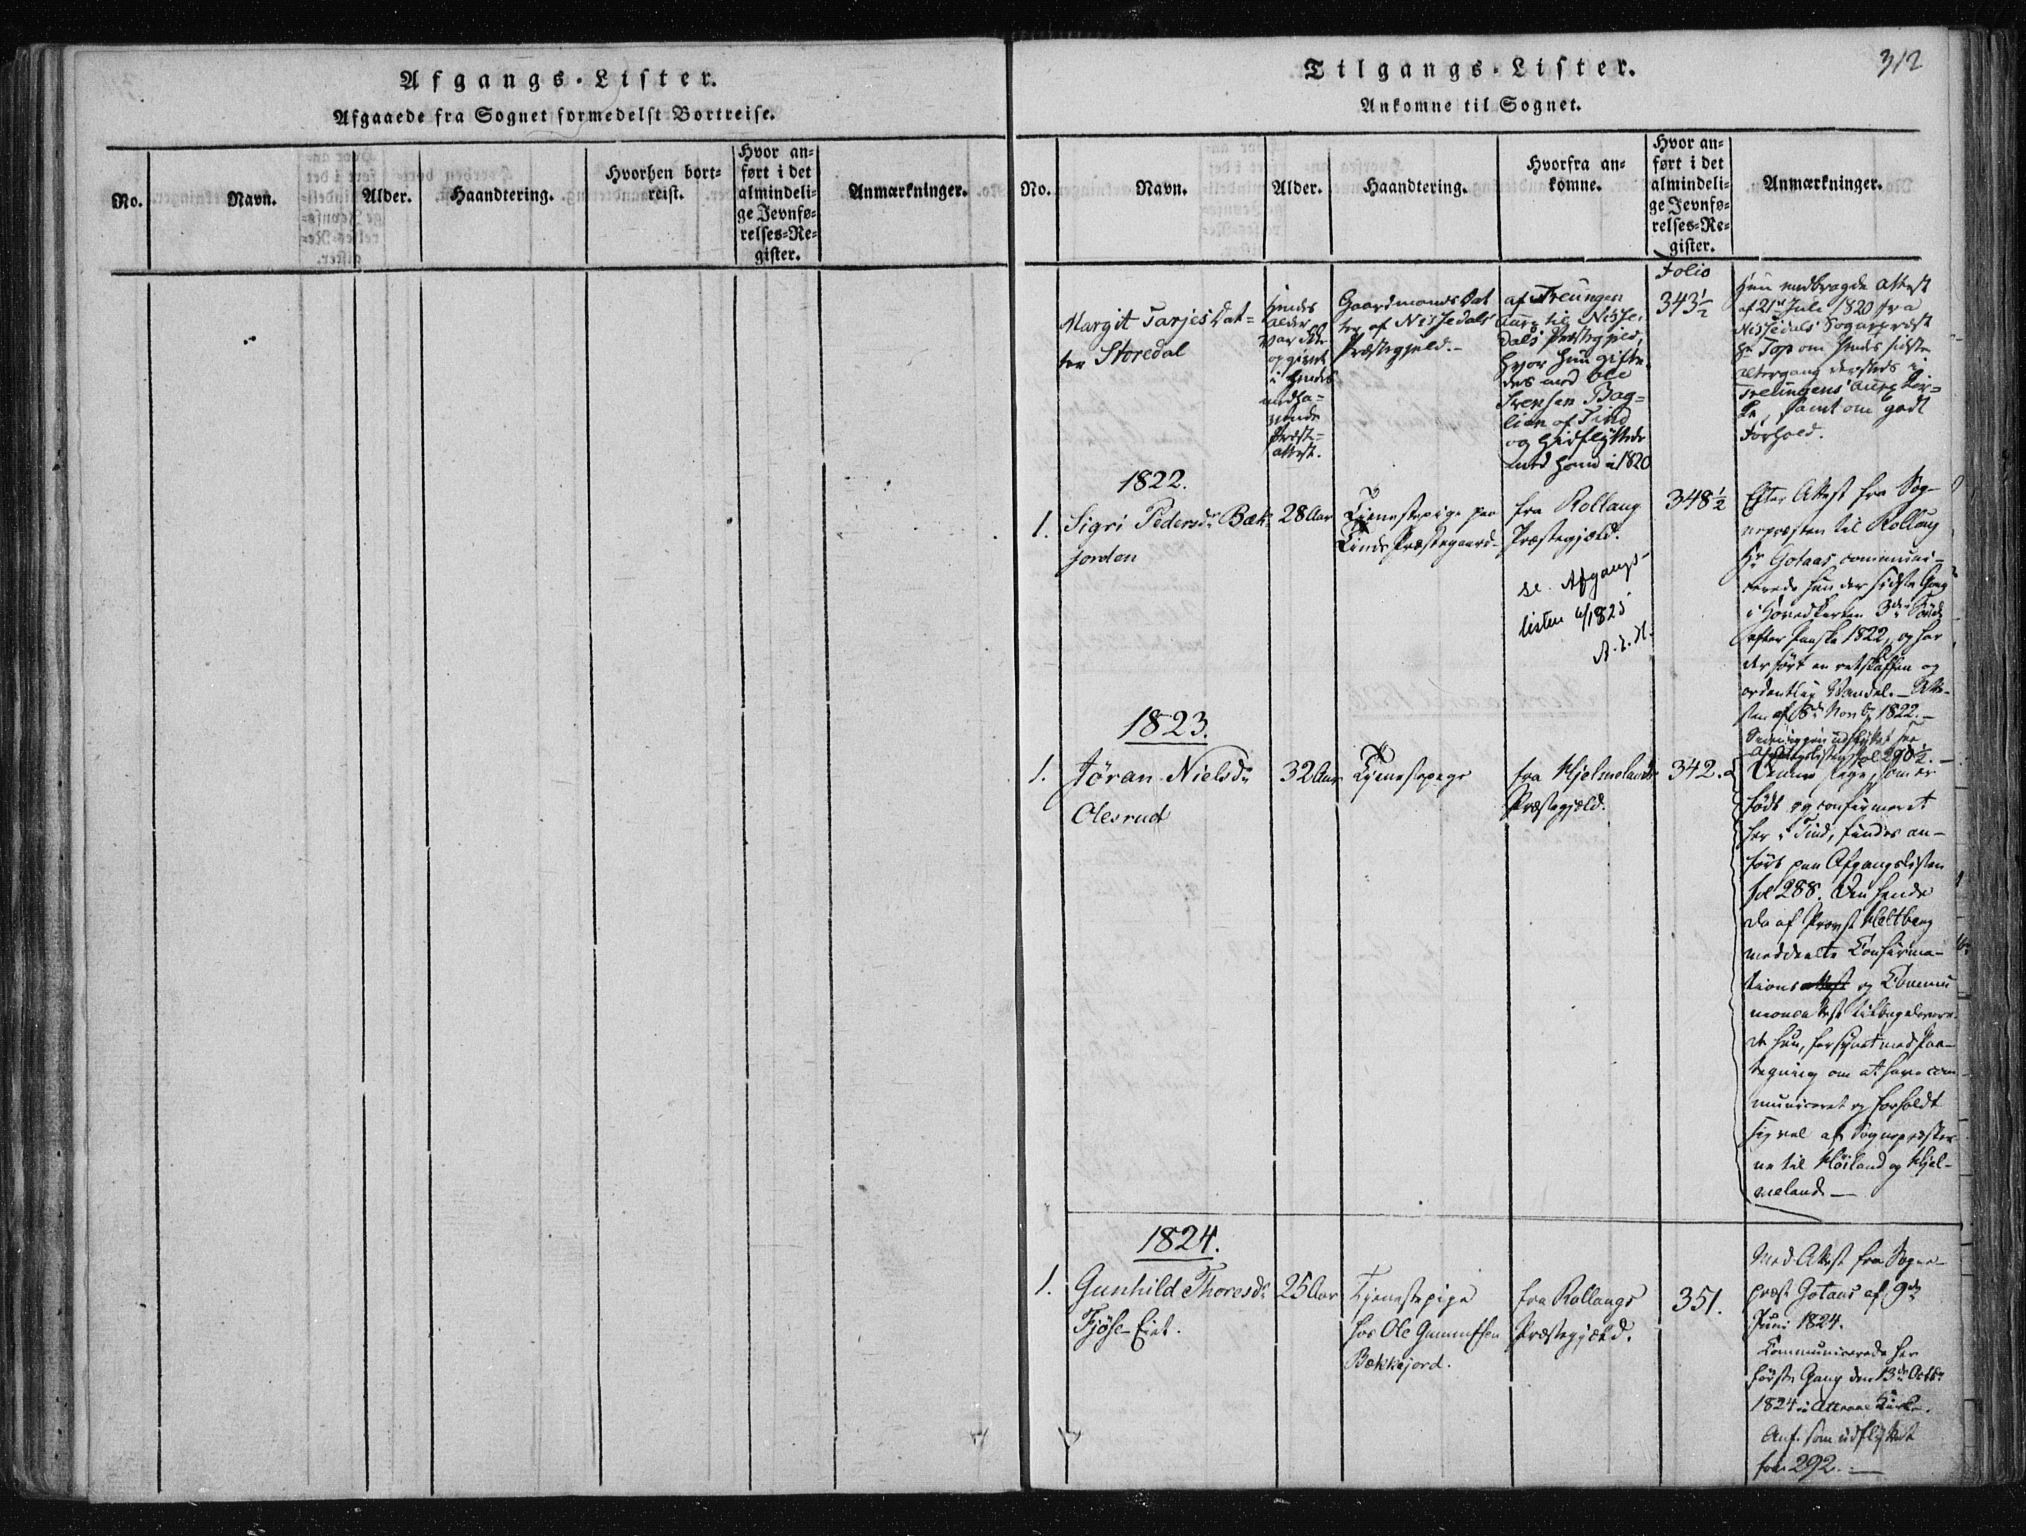 SAKO, Tinn kirkebøker, F/Fa/L0004: Ministerialbok nr. I 4, 1815-1843, s. 312